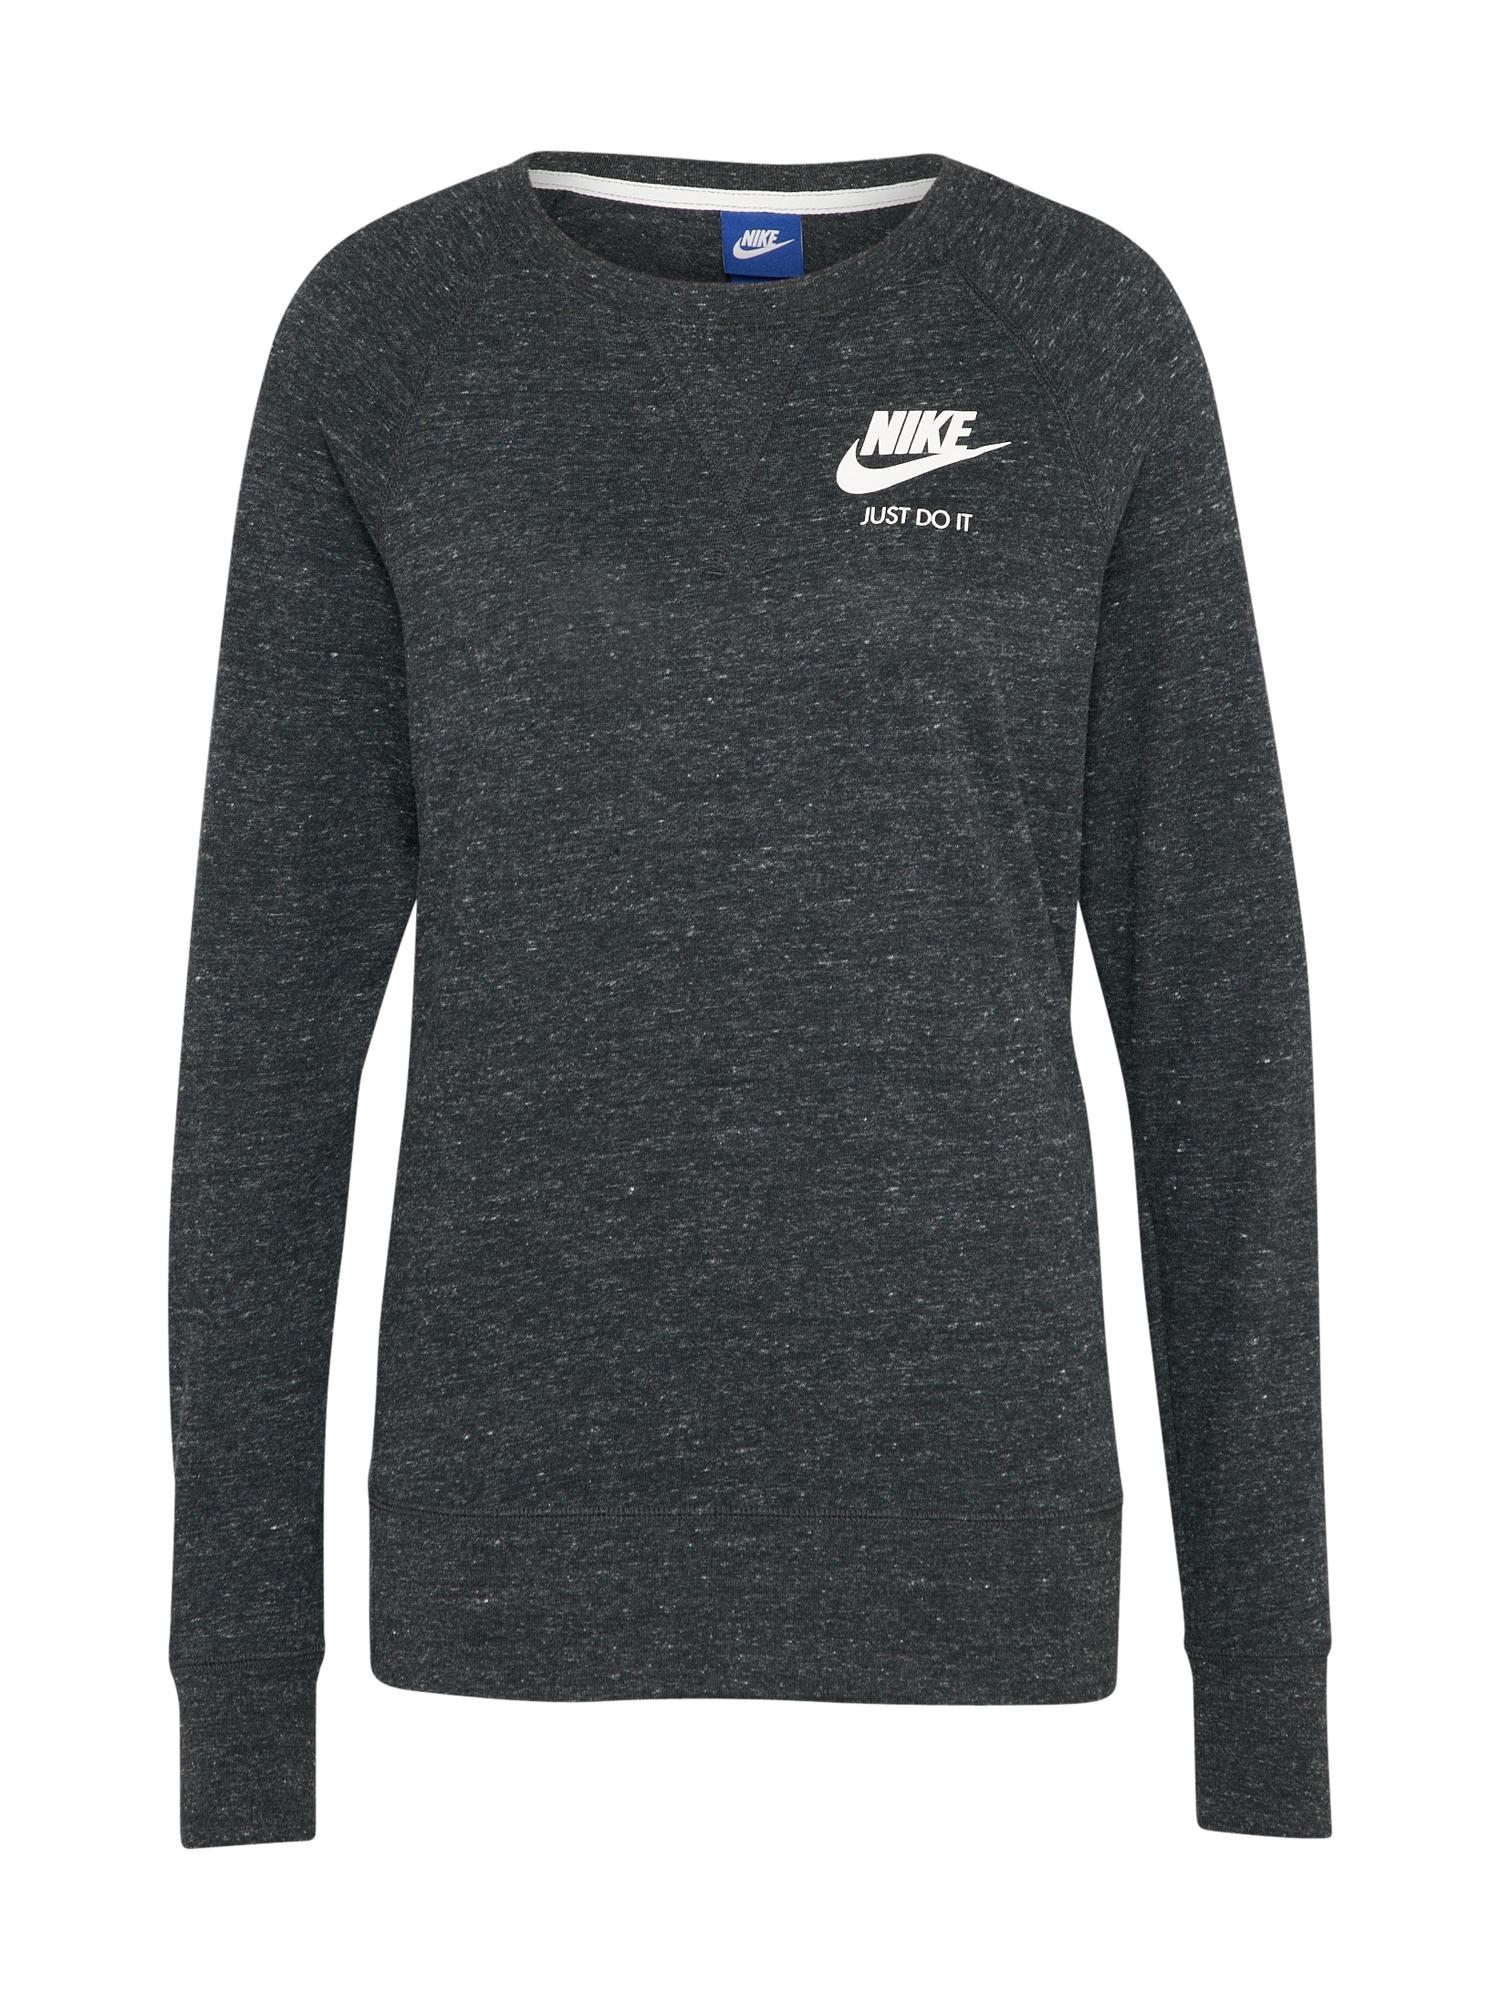 Nike Sportswear, Dames Sweatshirt 'Crew', antraciet